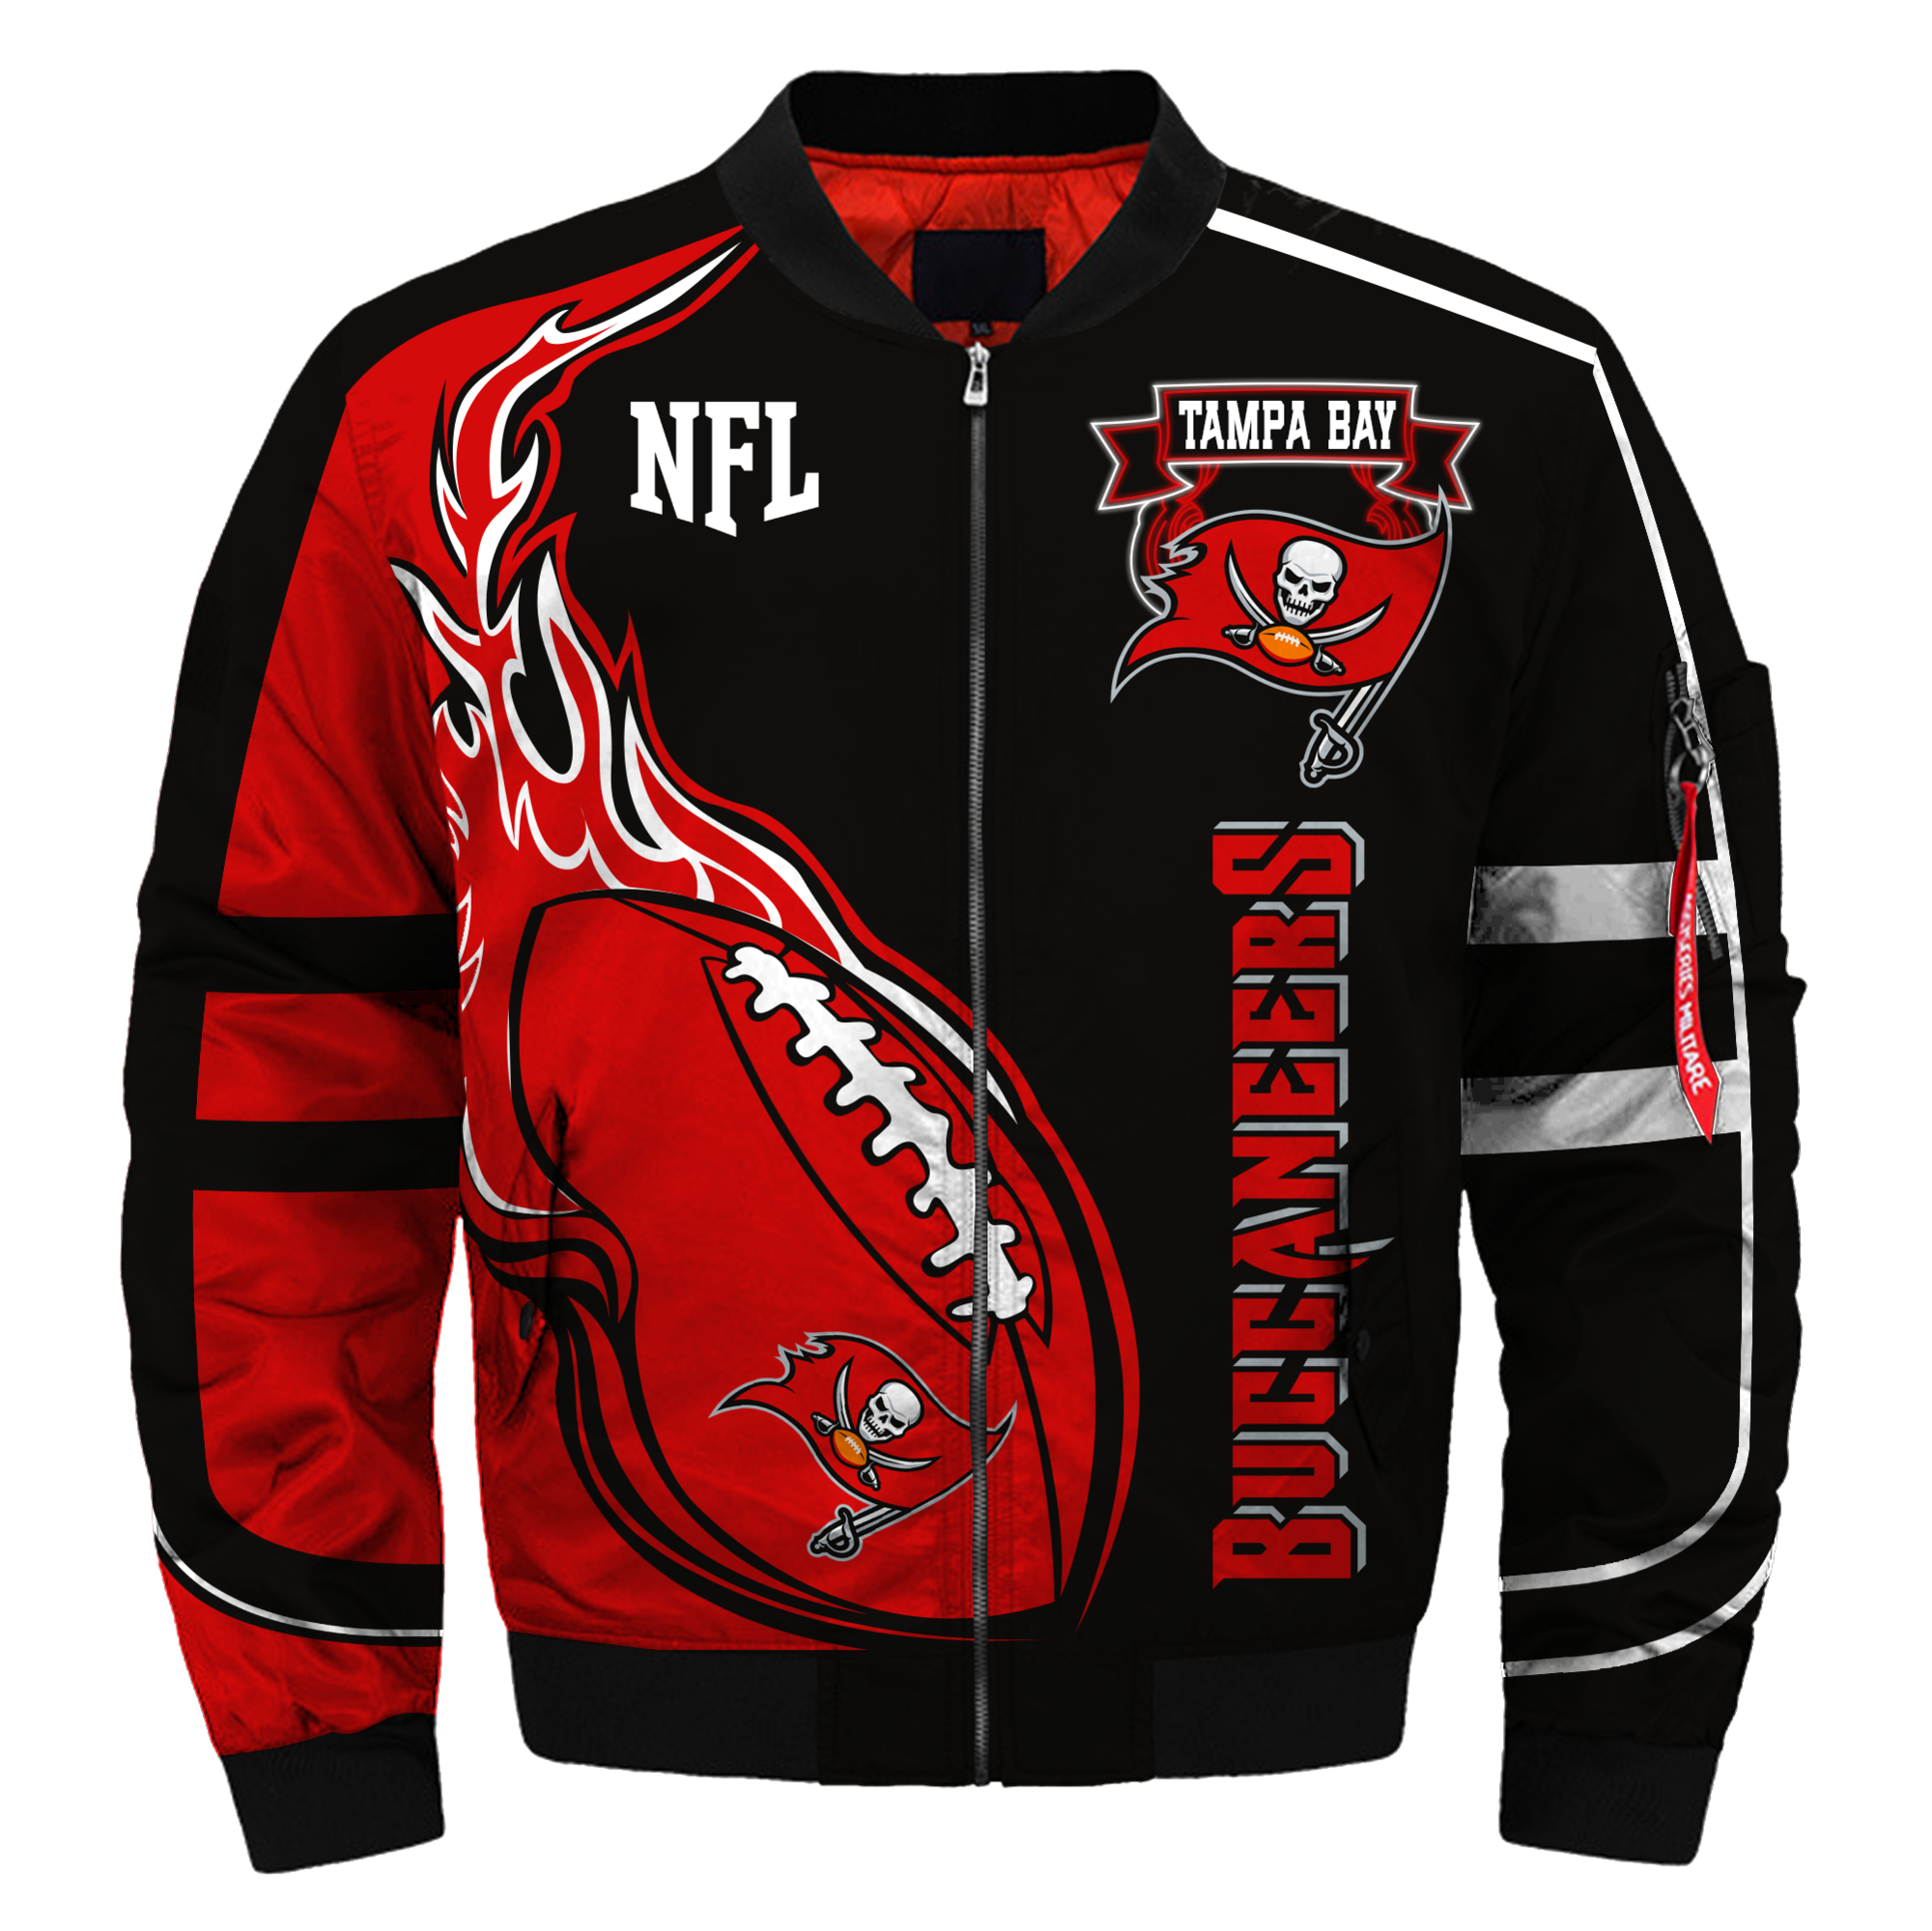 Tampa Bay Buccaneers Bomber Jacket Nfl Tampa Bay Buccaneers Apparel Bomber Jacket Winter Bomber Jacket Fashion Tampa Bay Buccaneers